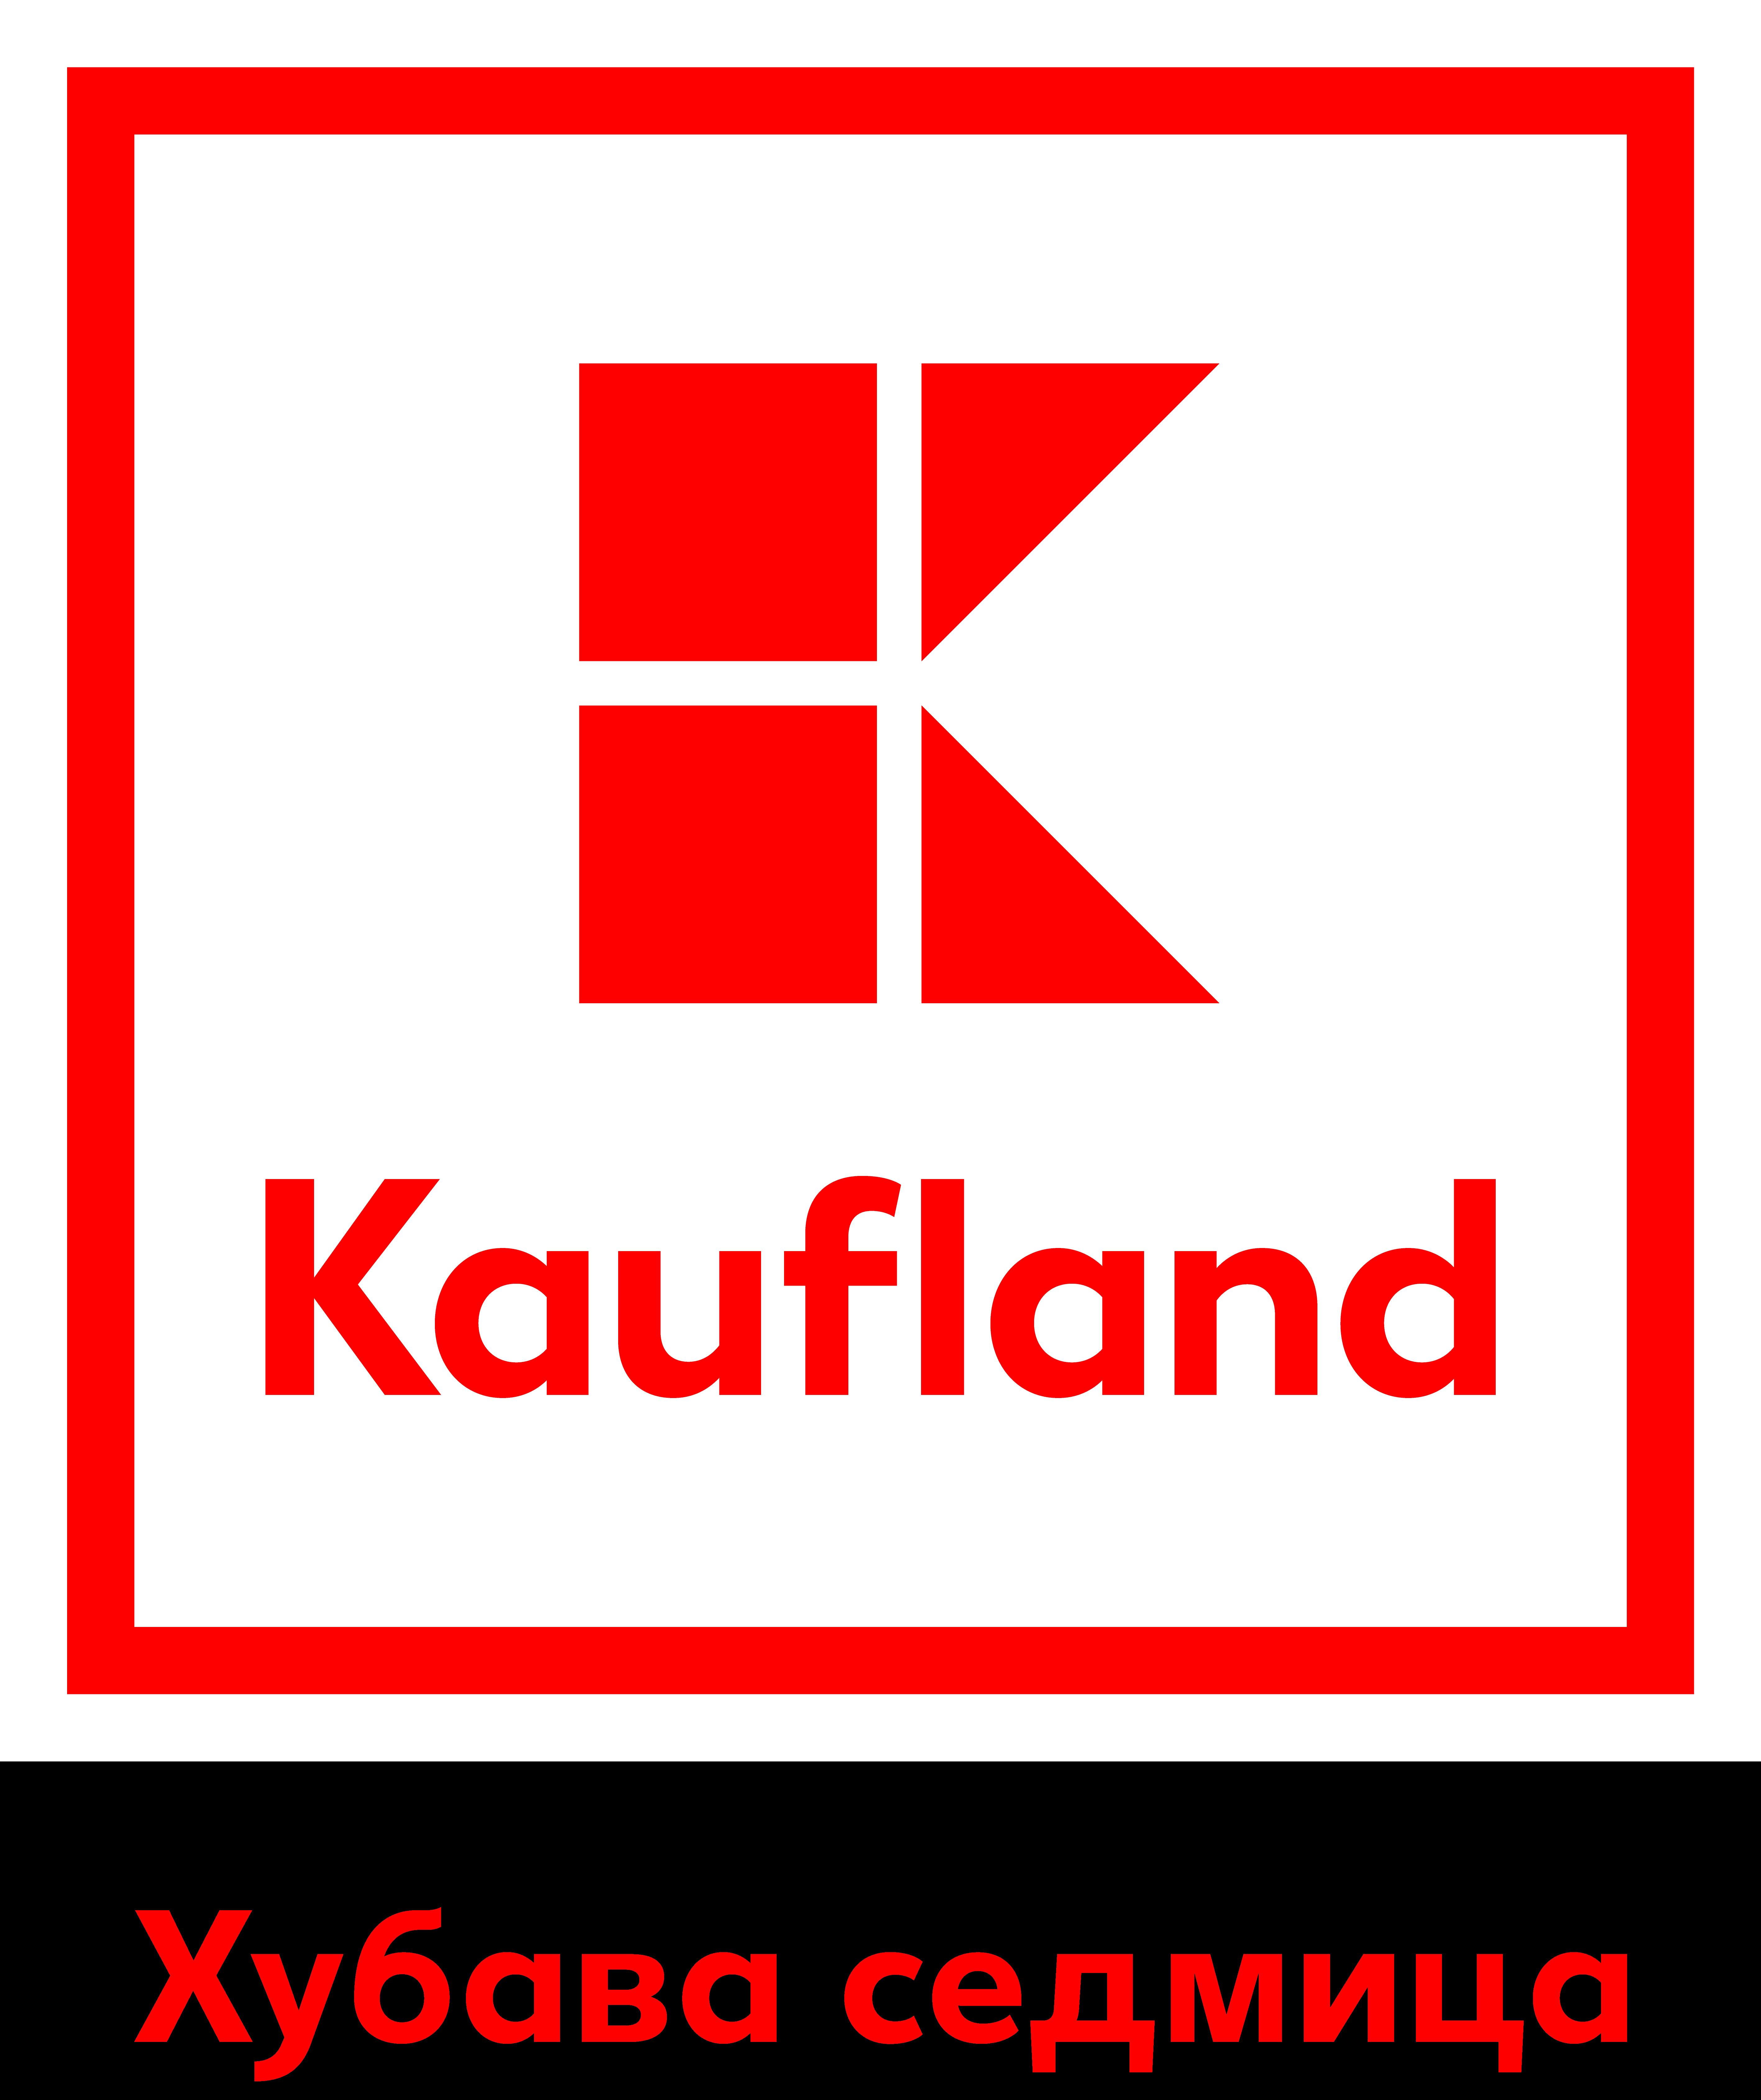 Kaufland Кауфланд Бургаc-Изгрев